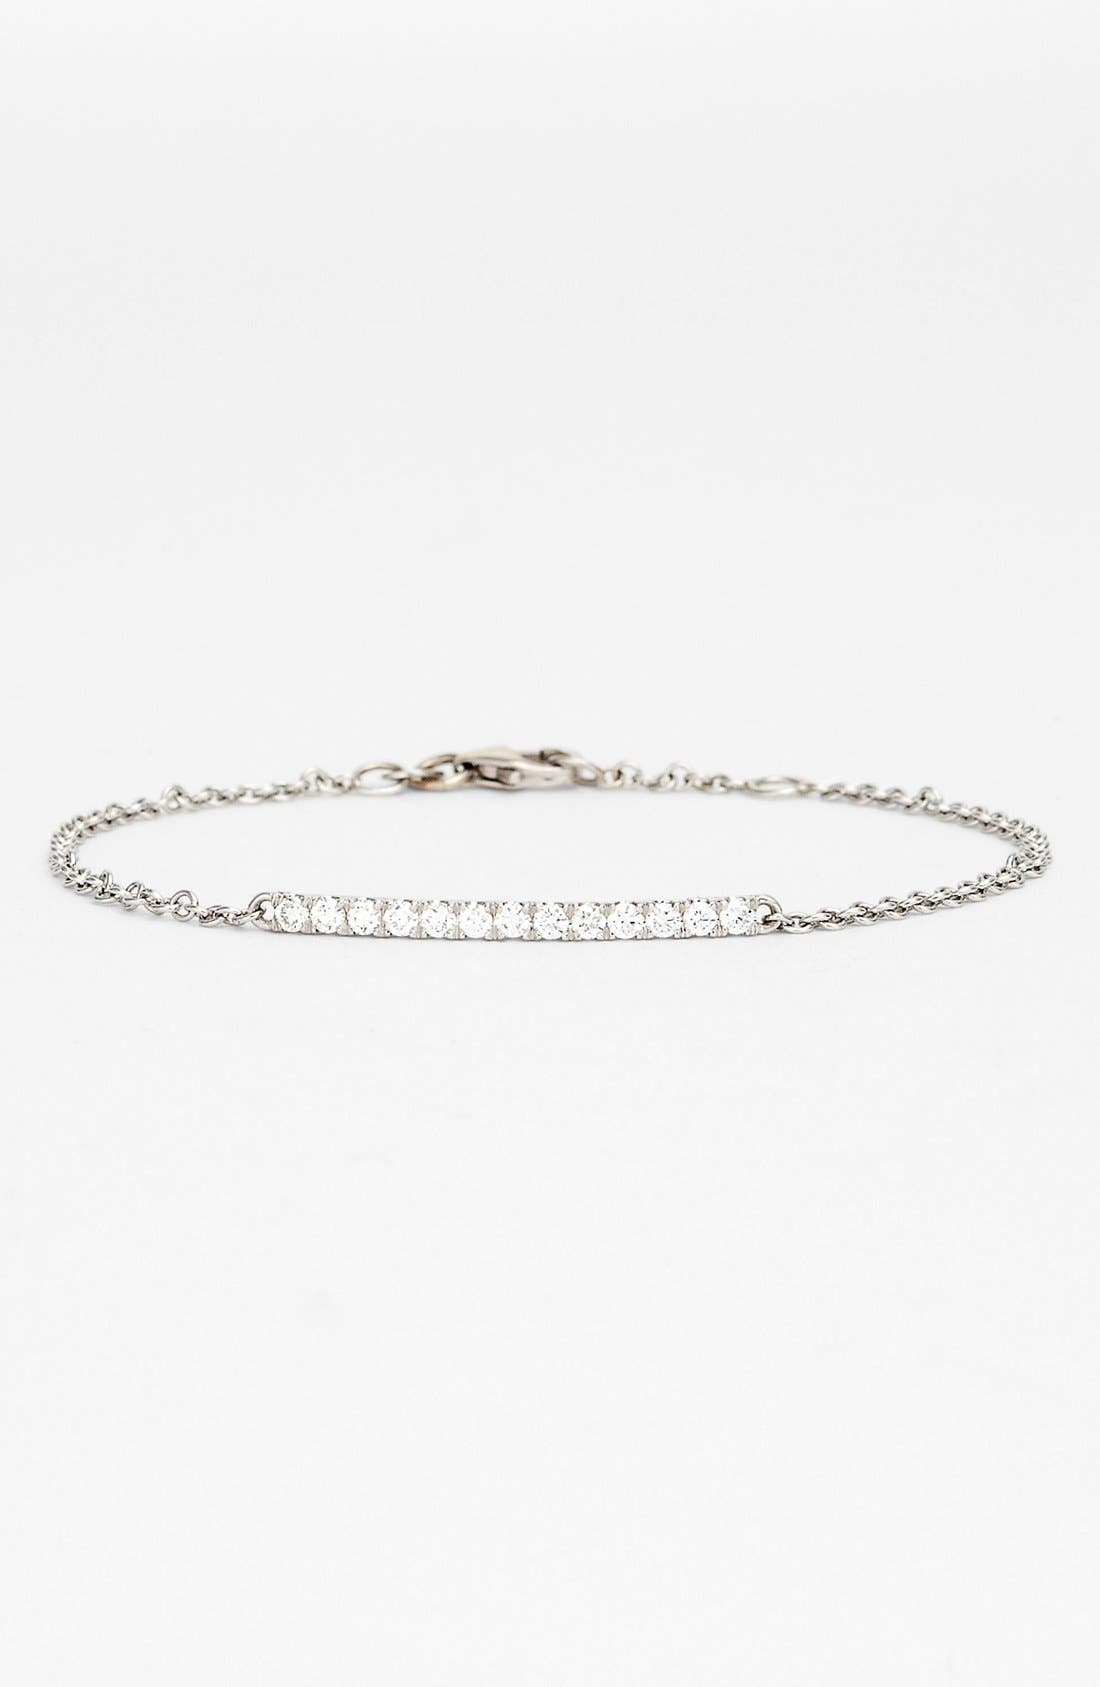 Main Image - Bony Levy 'Stick' Pavé Diamond Bar Bracelet (Nordstrom Exclusive)